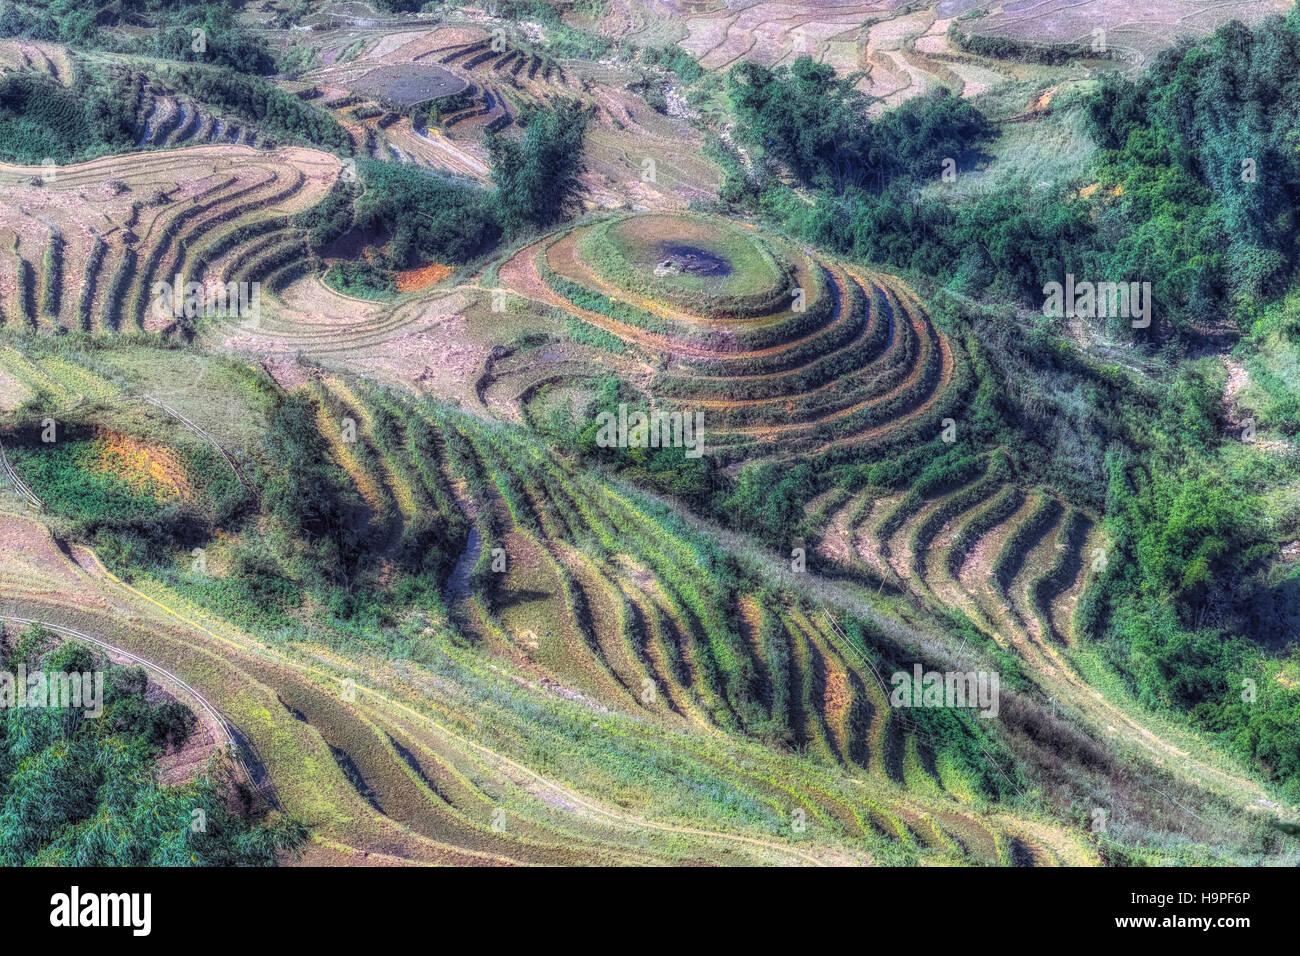 Reis Terrassen, Lao Cai, Sapa, Vietnam, Asien Stockbild